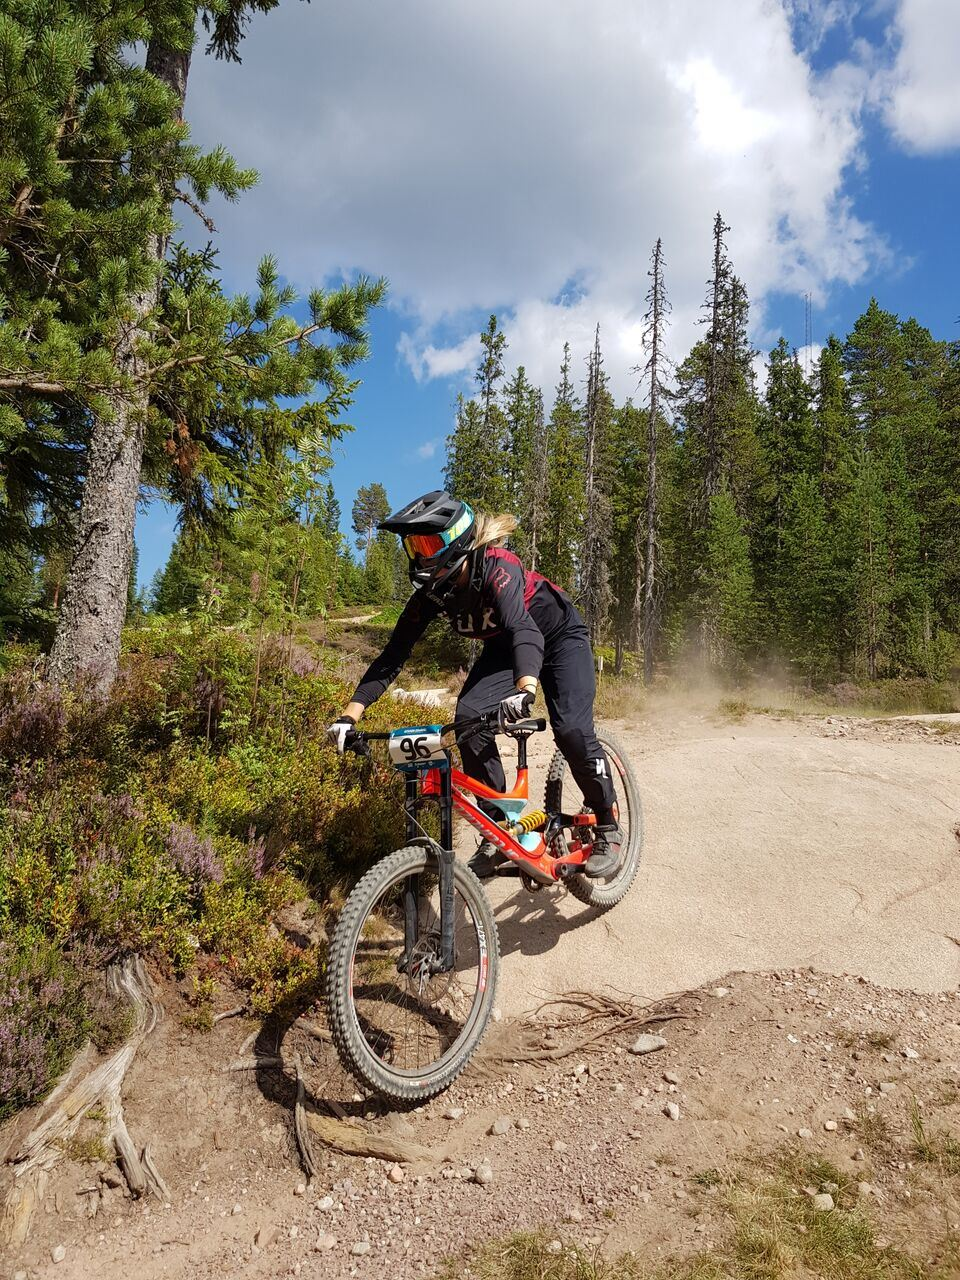 Gesundabergets Bike Park öppnar för säsongen